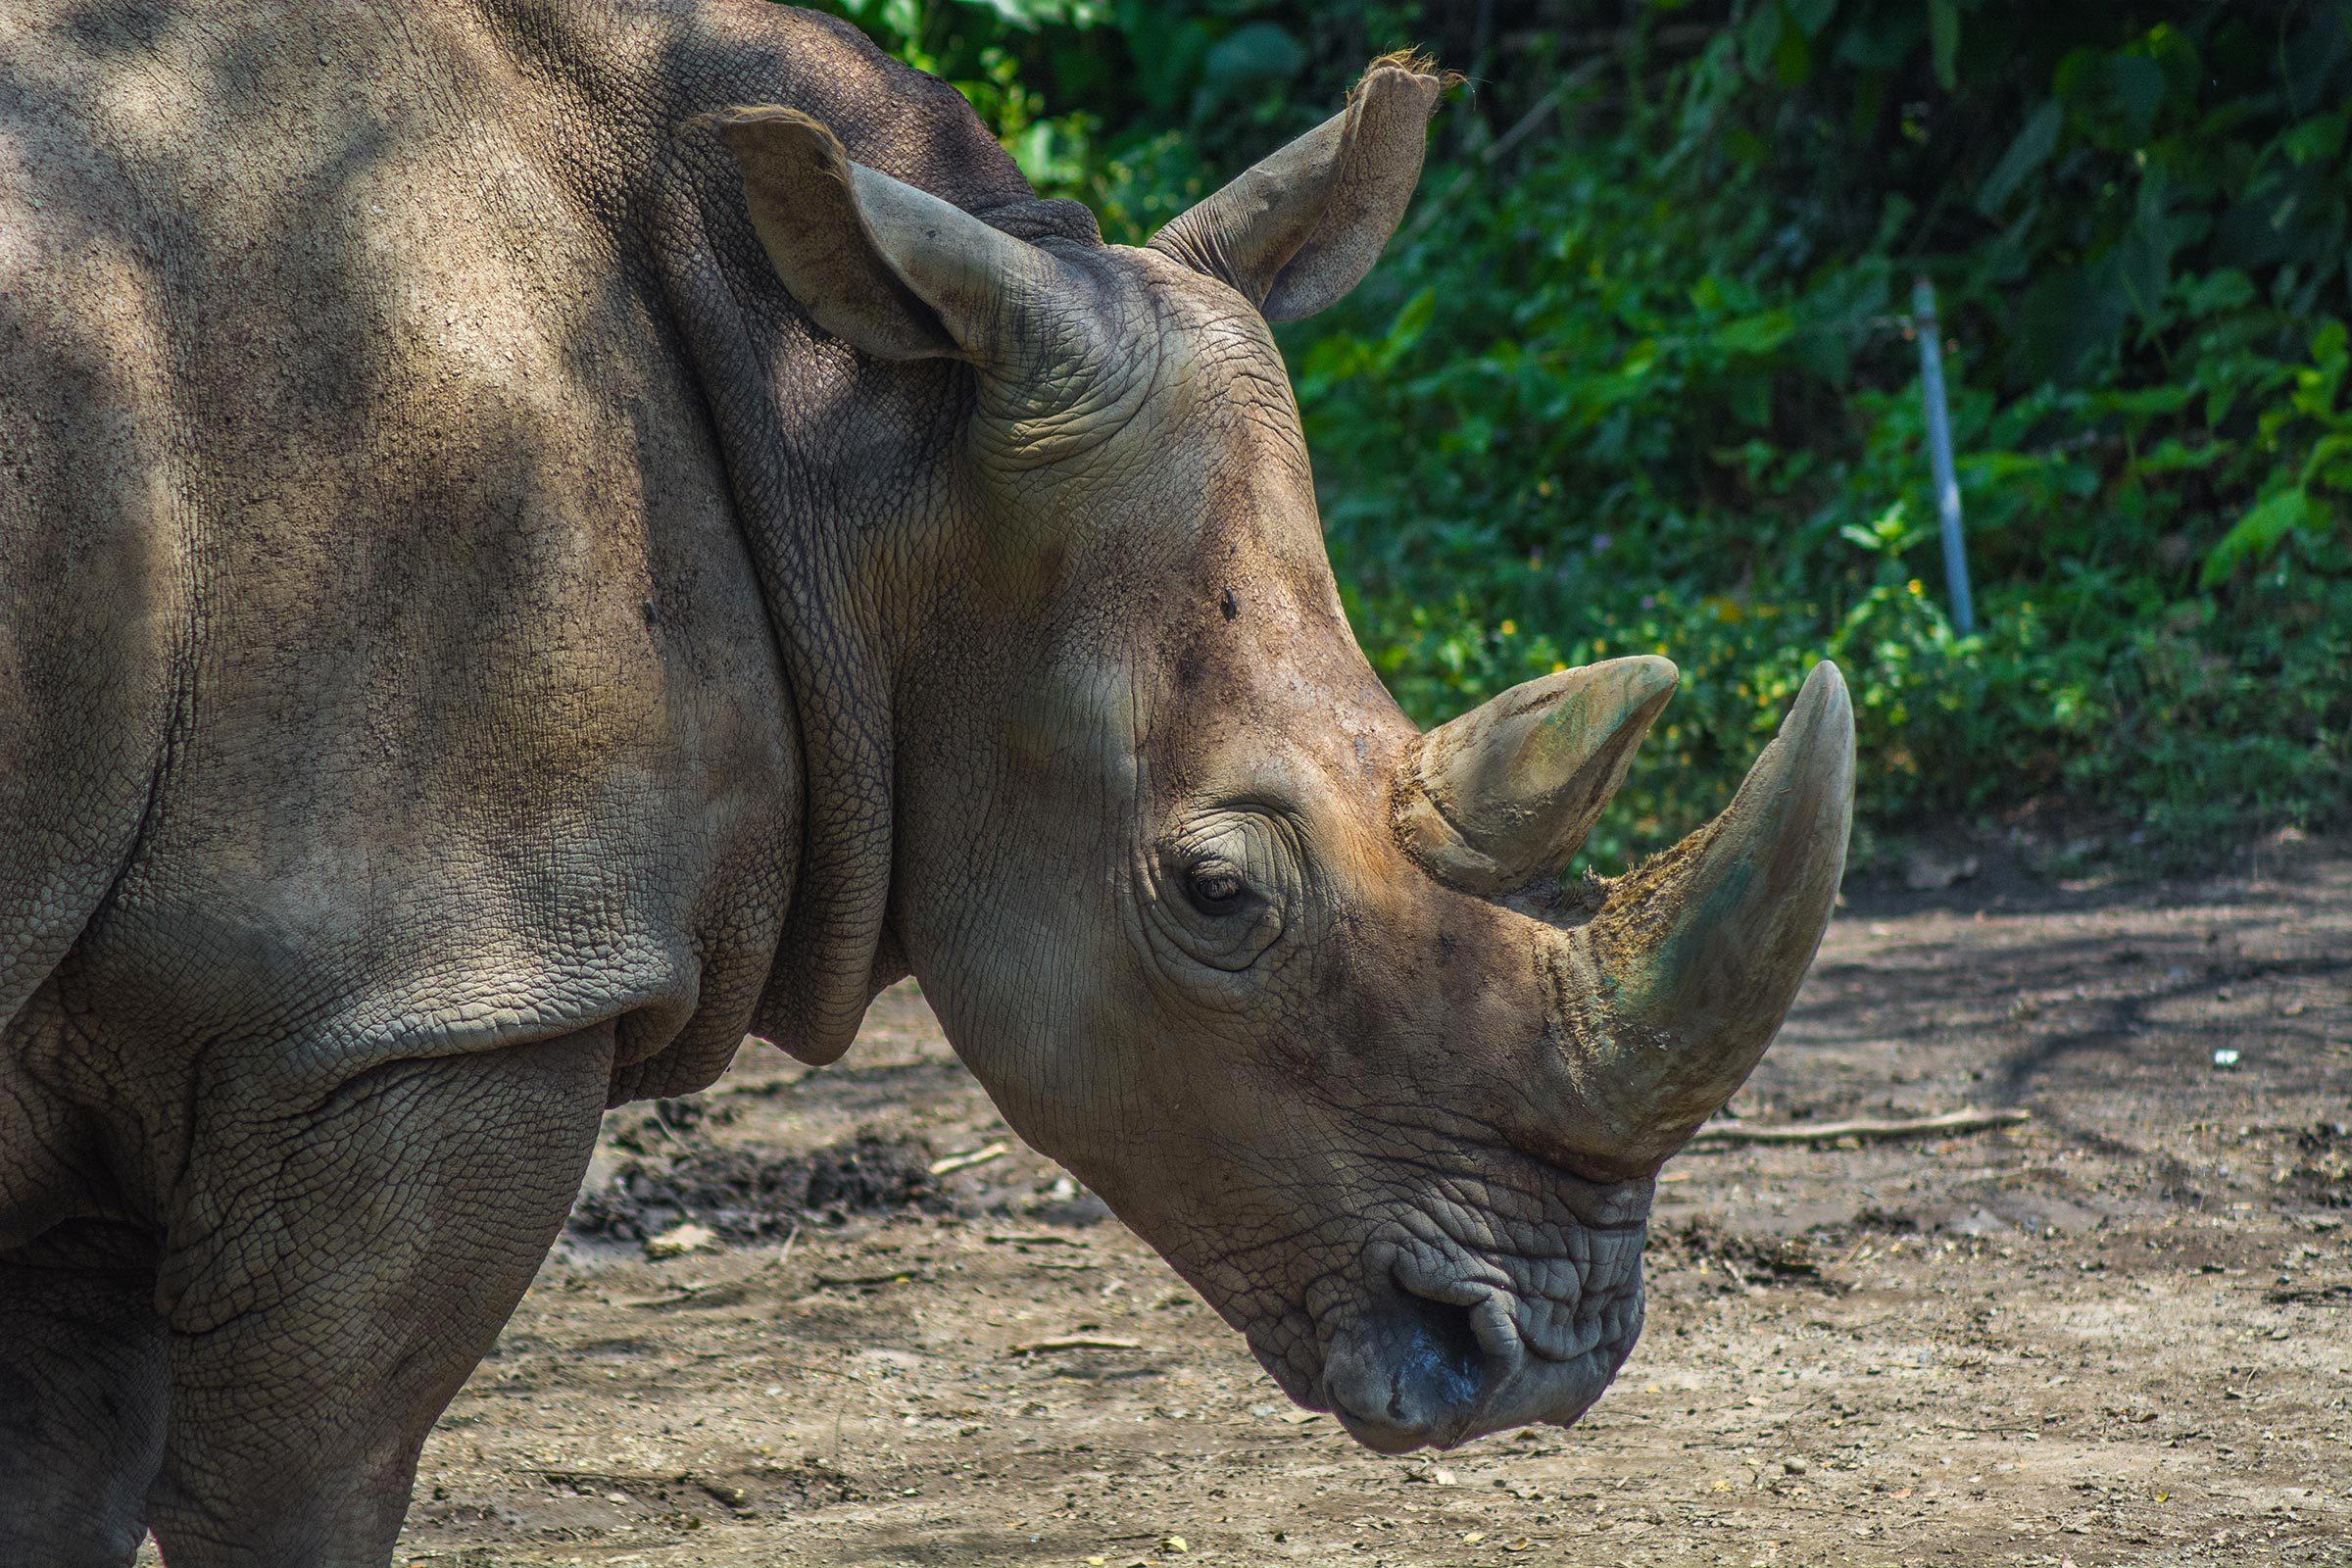 Espèces menacées : rhinocéros de Sumatra (Dicerorhinus sumatrensis)